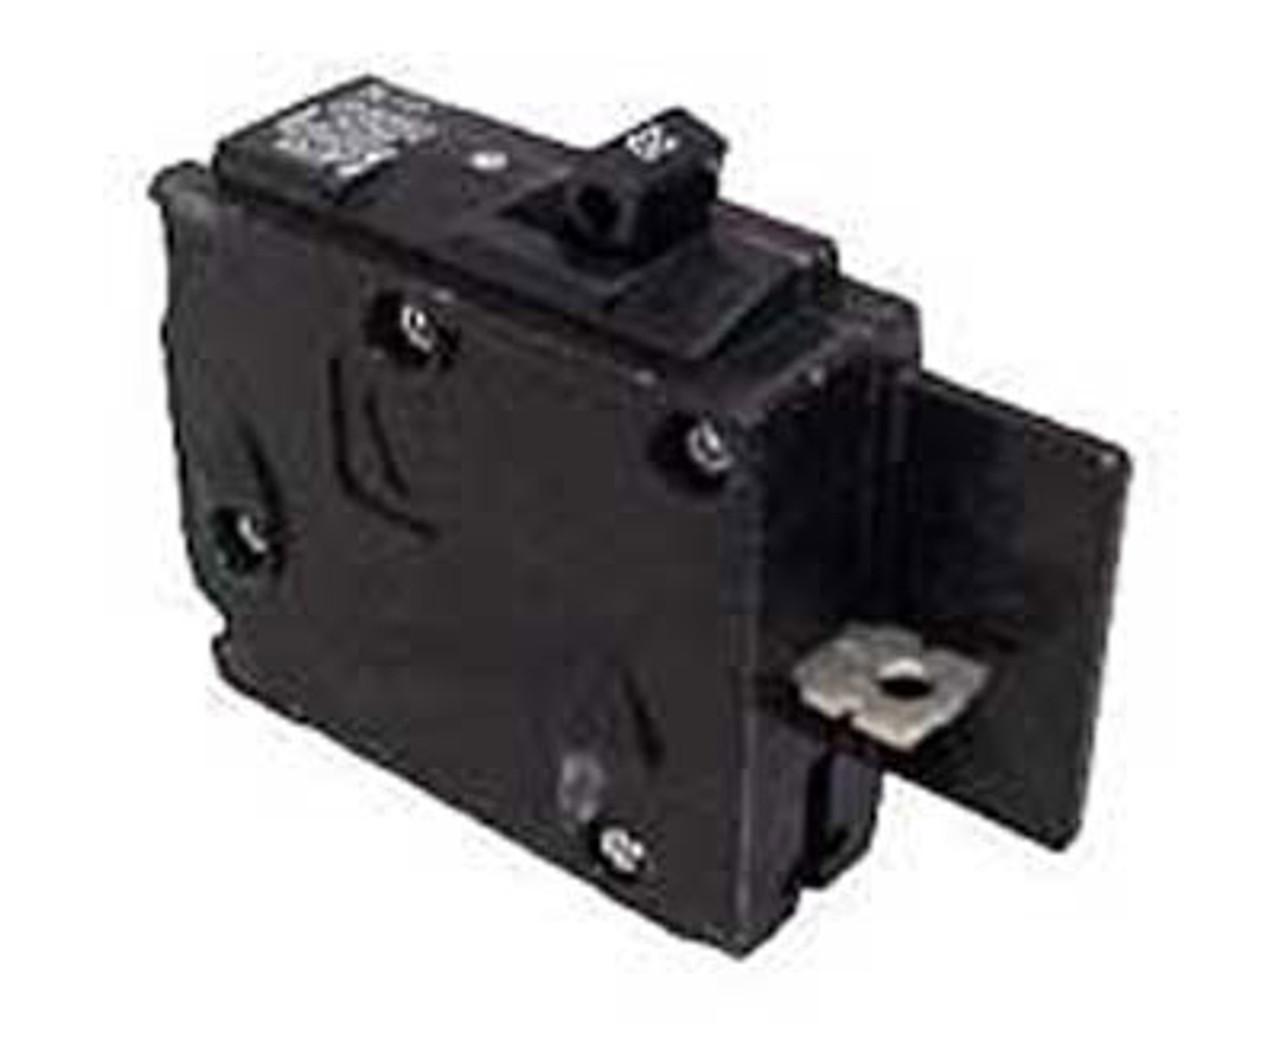 Q120 SIEMENS PLUG-IN CIRCUIT BREAKER 1 POLE 20 AMP 120 VAC NEW